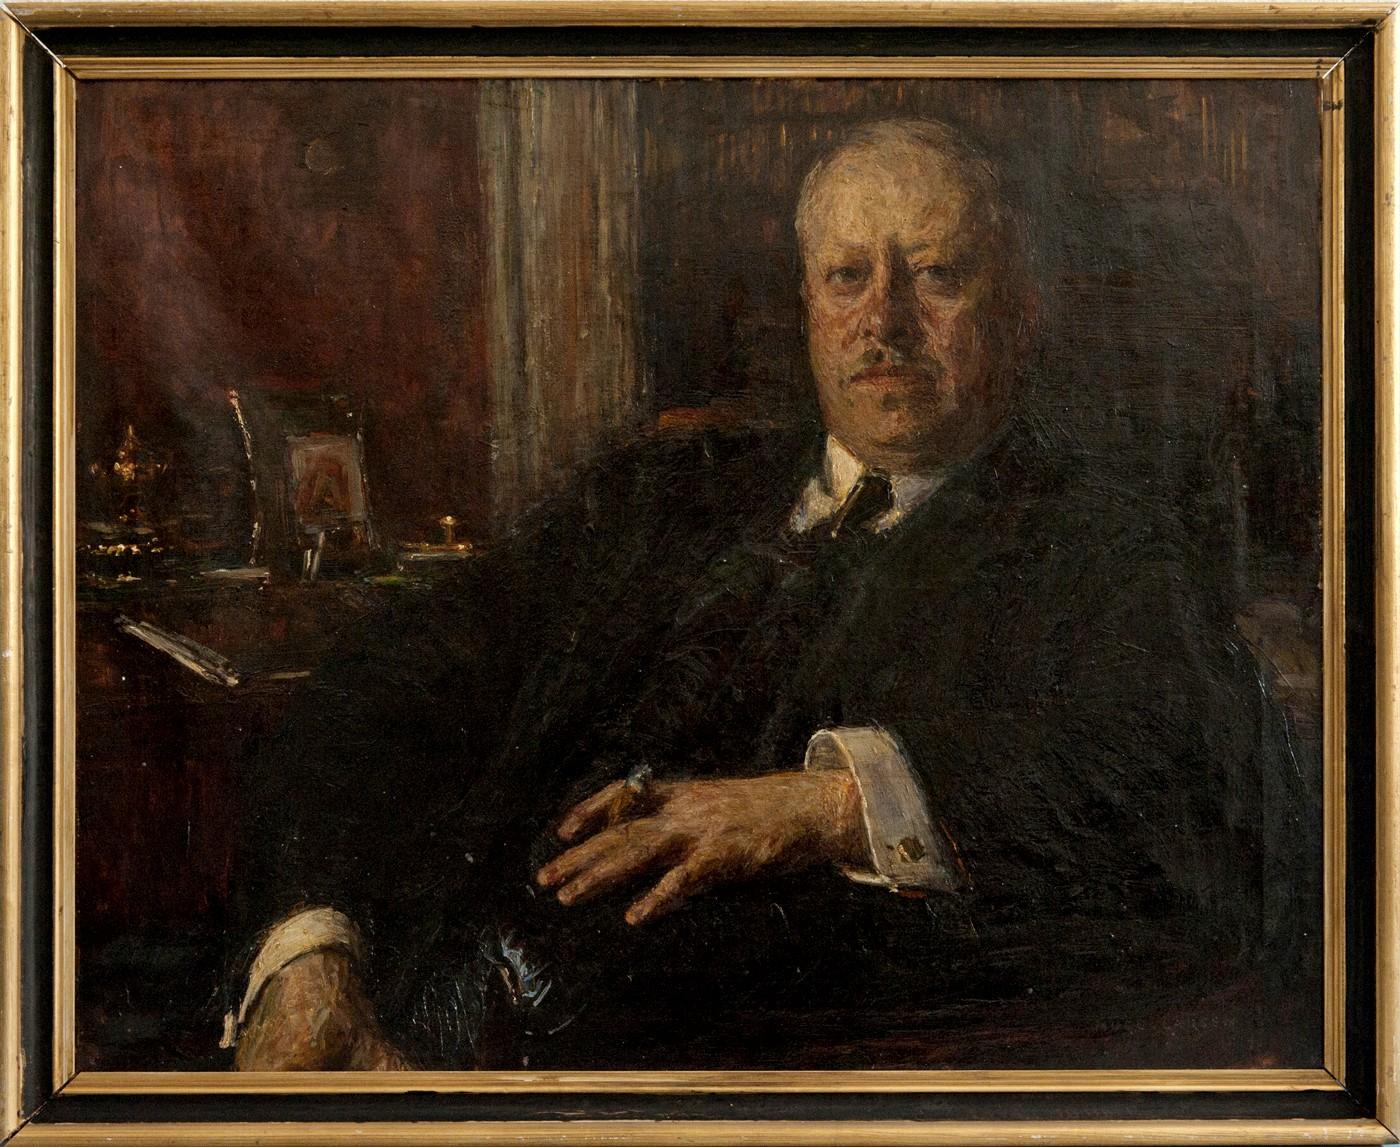 VERKAUFT! - Beim Generalkonsul (1914)